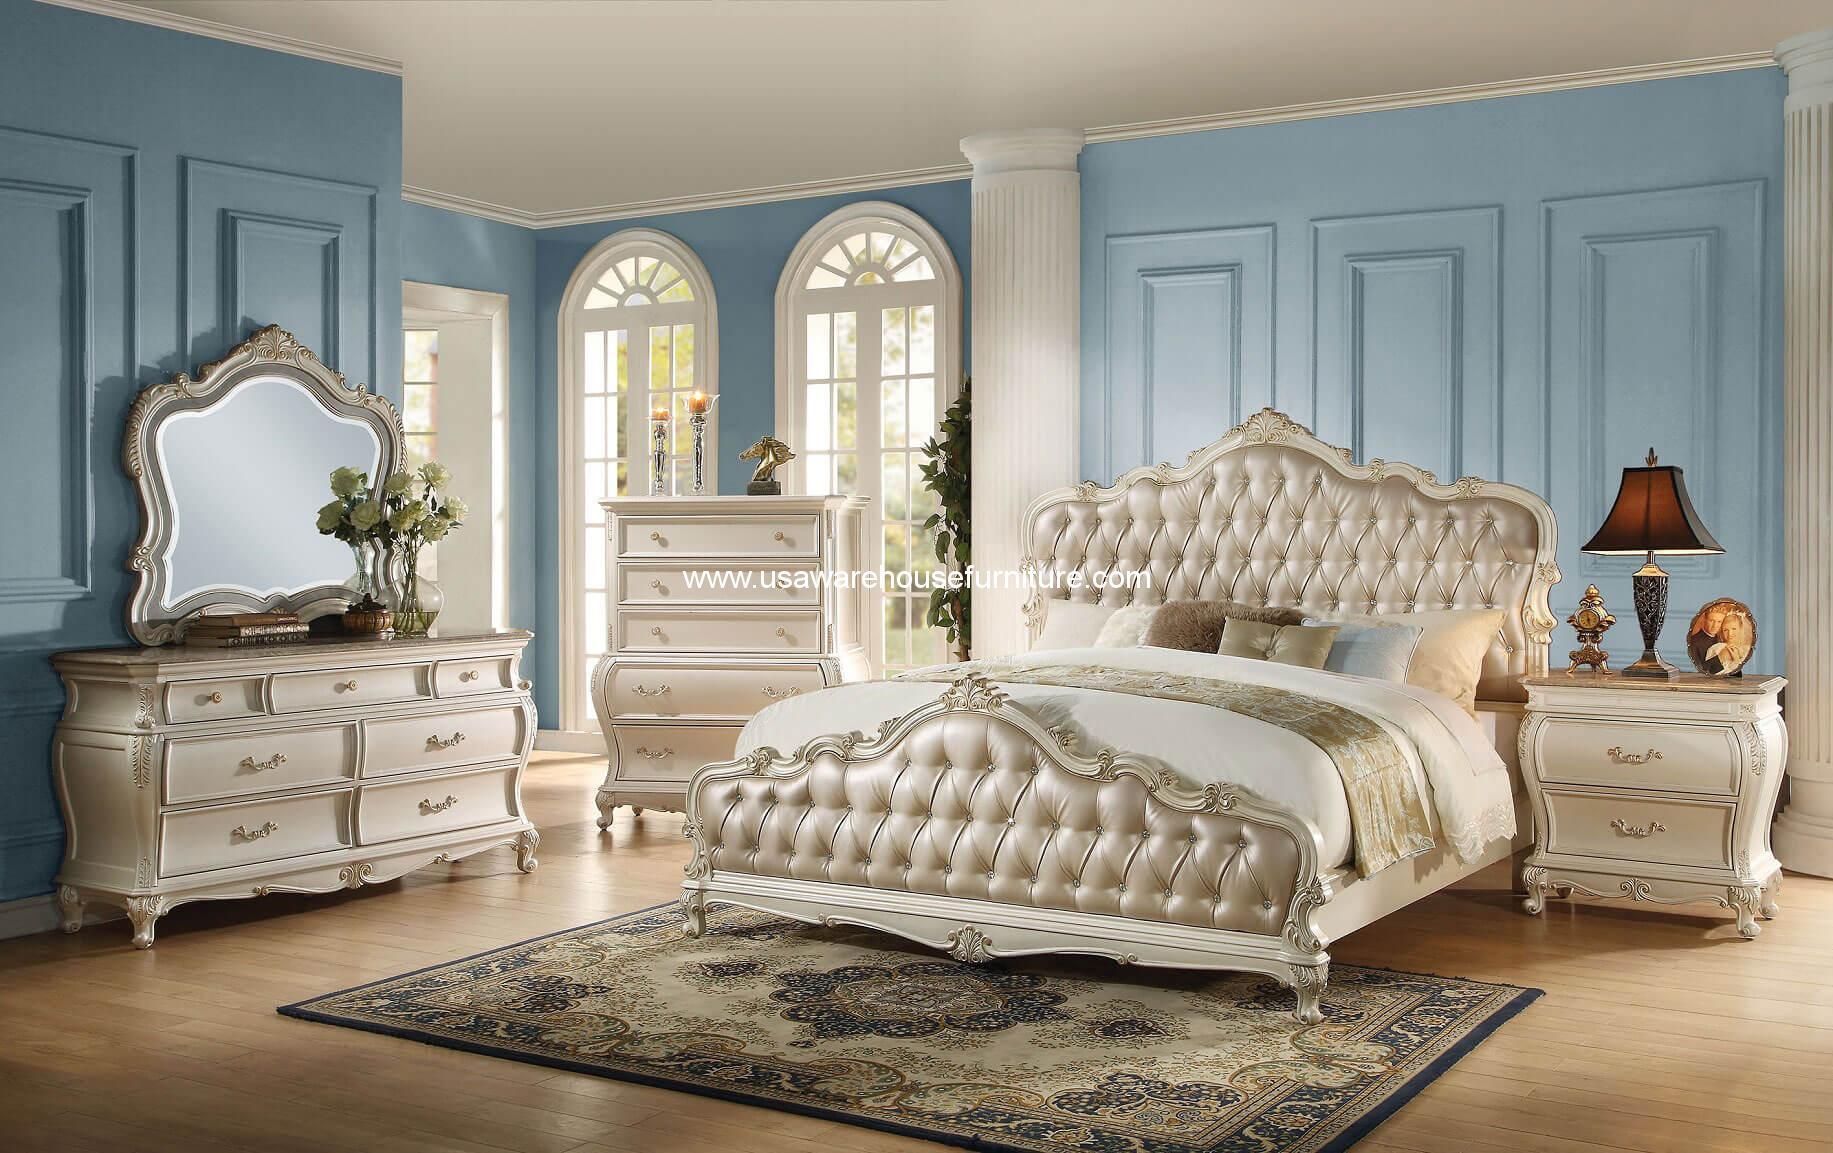 Chantelle Pearl White Finish 4 Piece Bedroom Set USA Warehouse Furniture